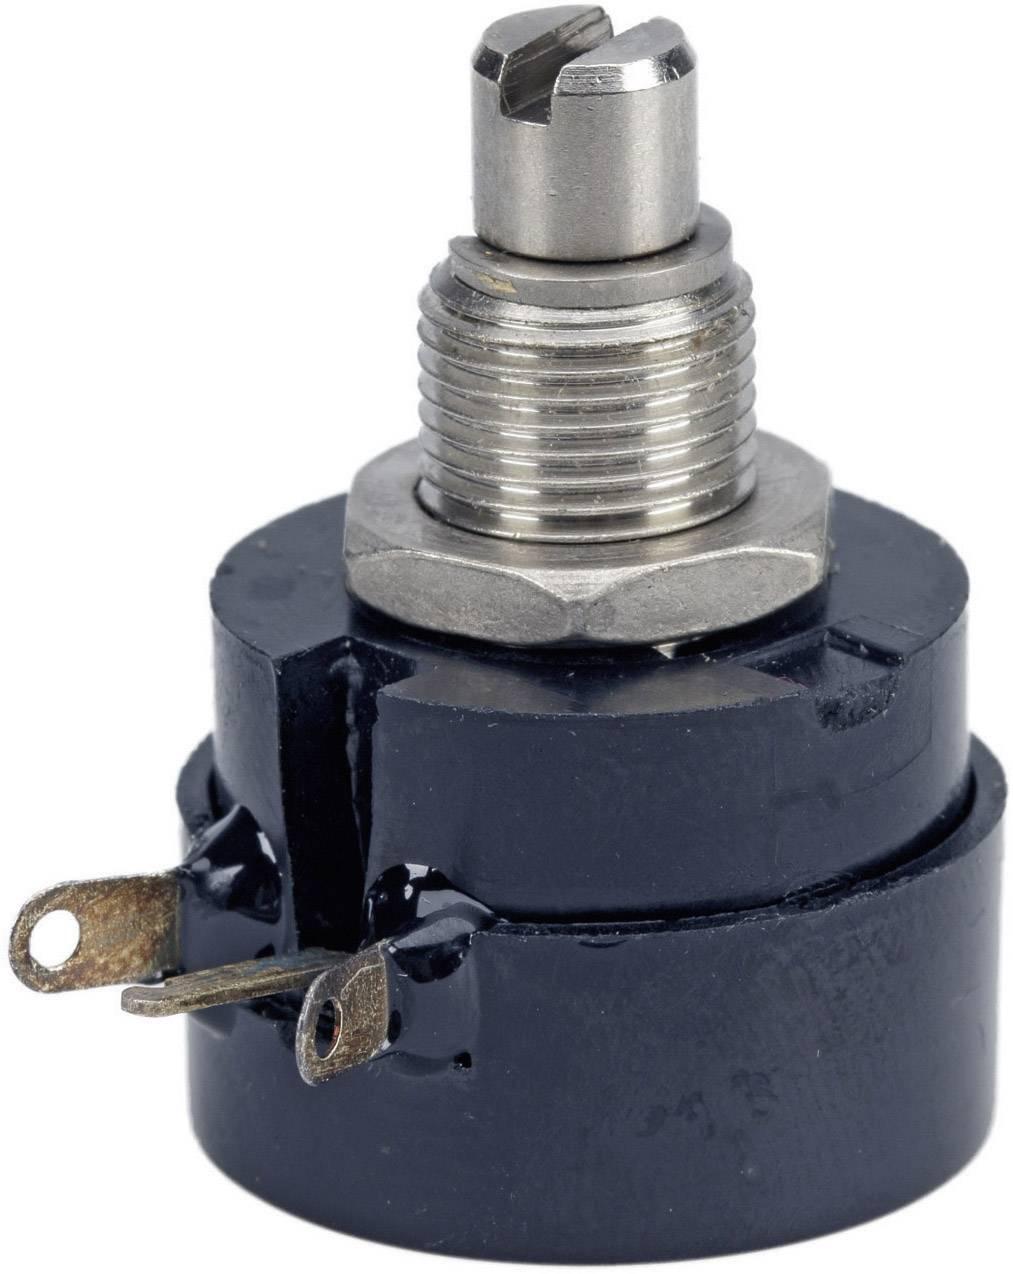 Drôtový potenciometer TT Electro, 3101106910, 100 Ω, 0.5 W, ± 10%